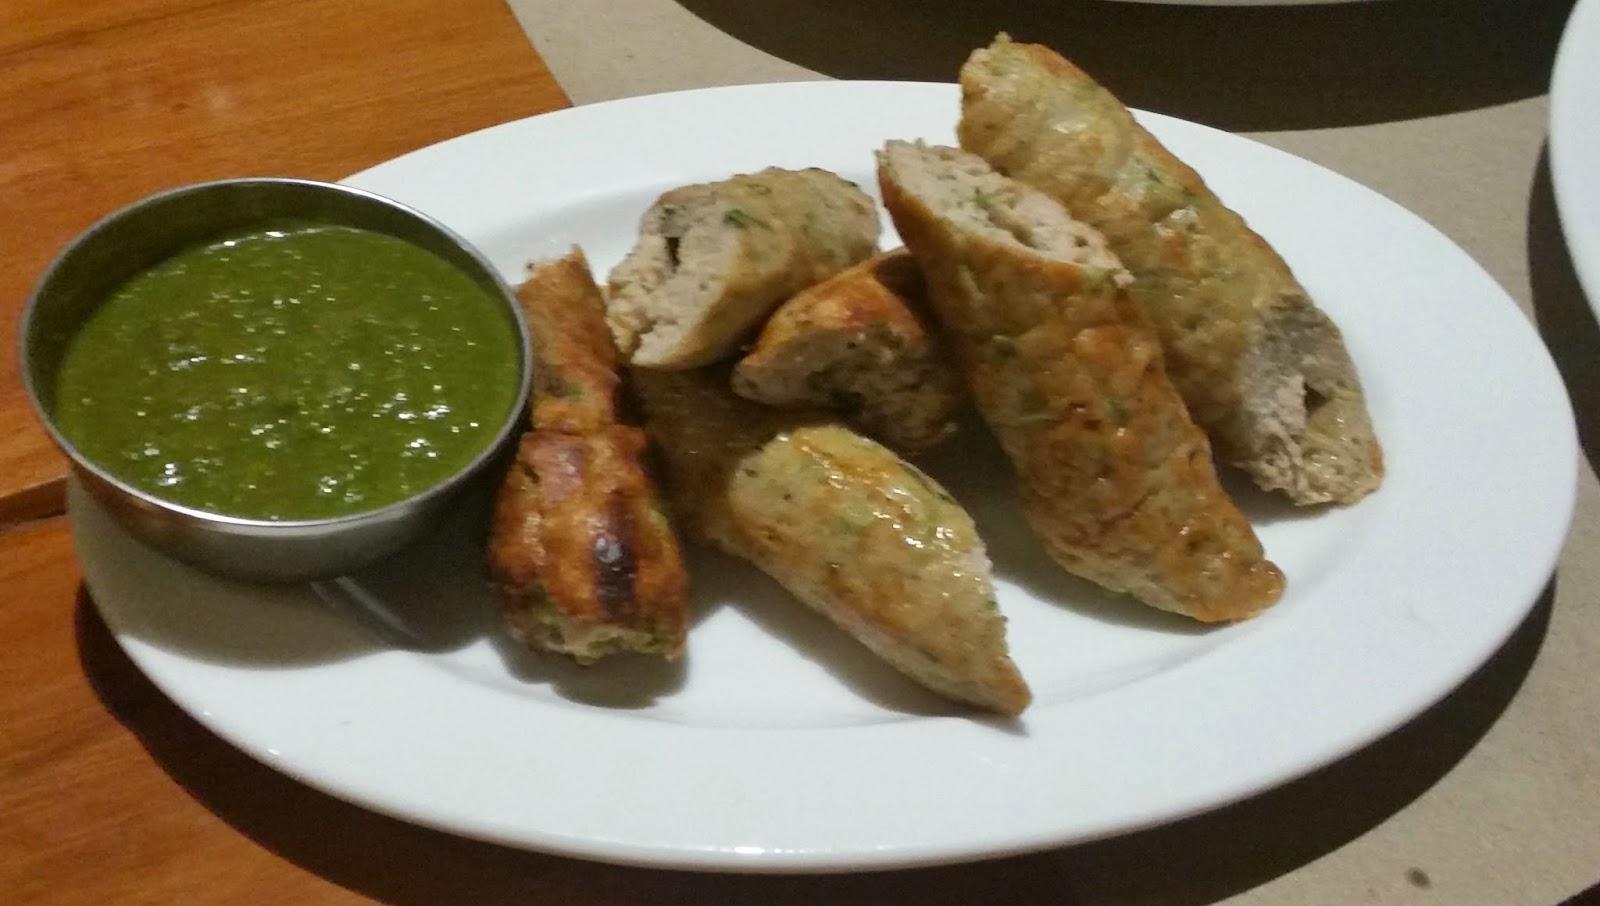 Deli 9 Seekh Kabab